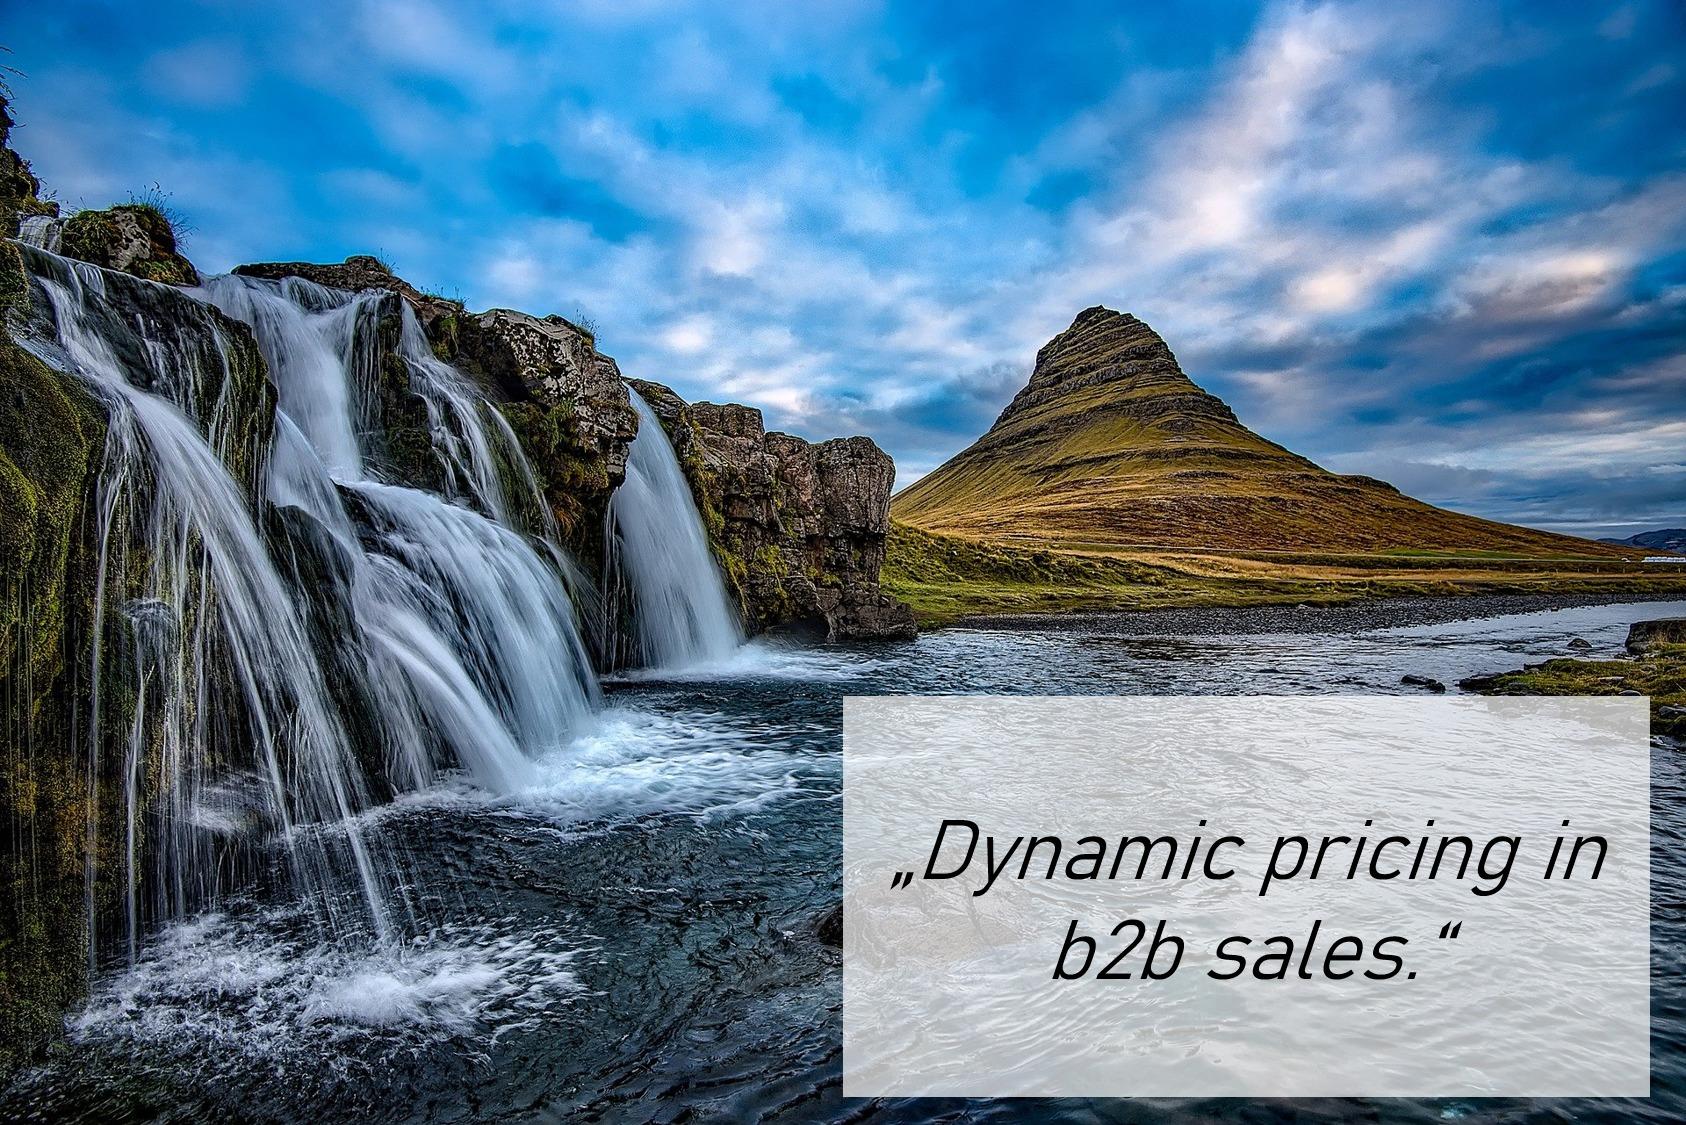 dynamic pricing in b2b sales